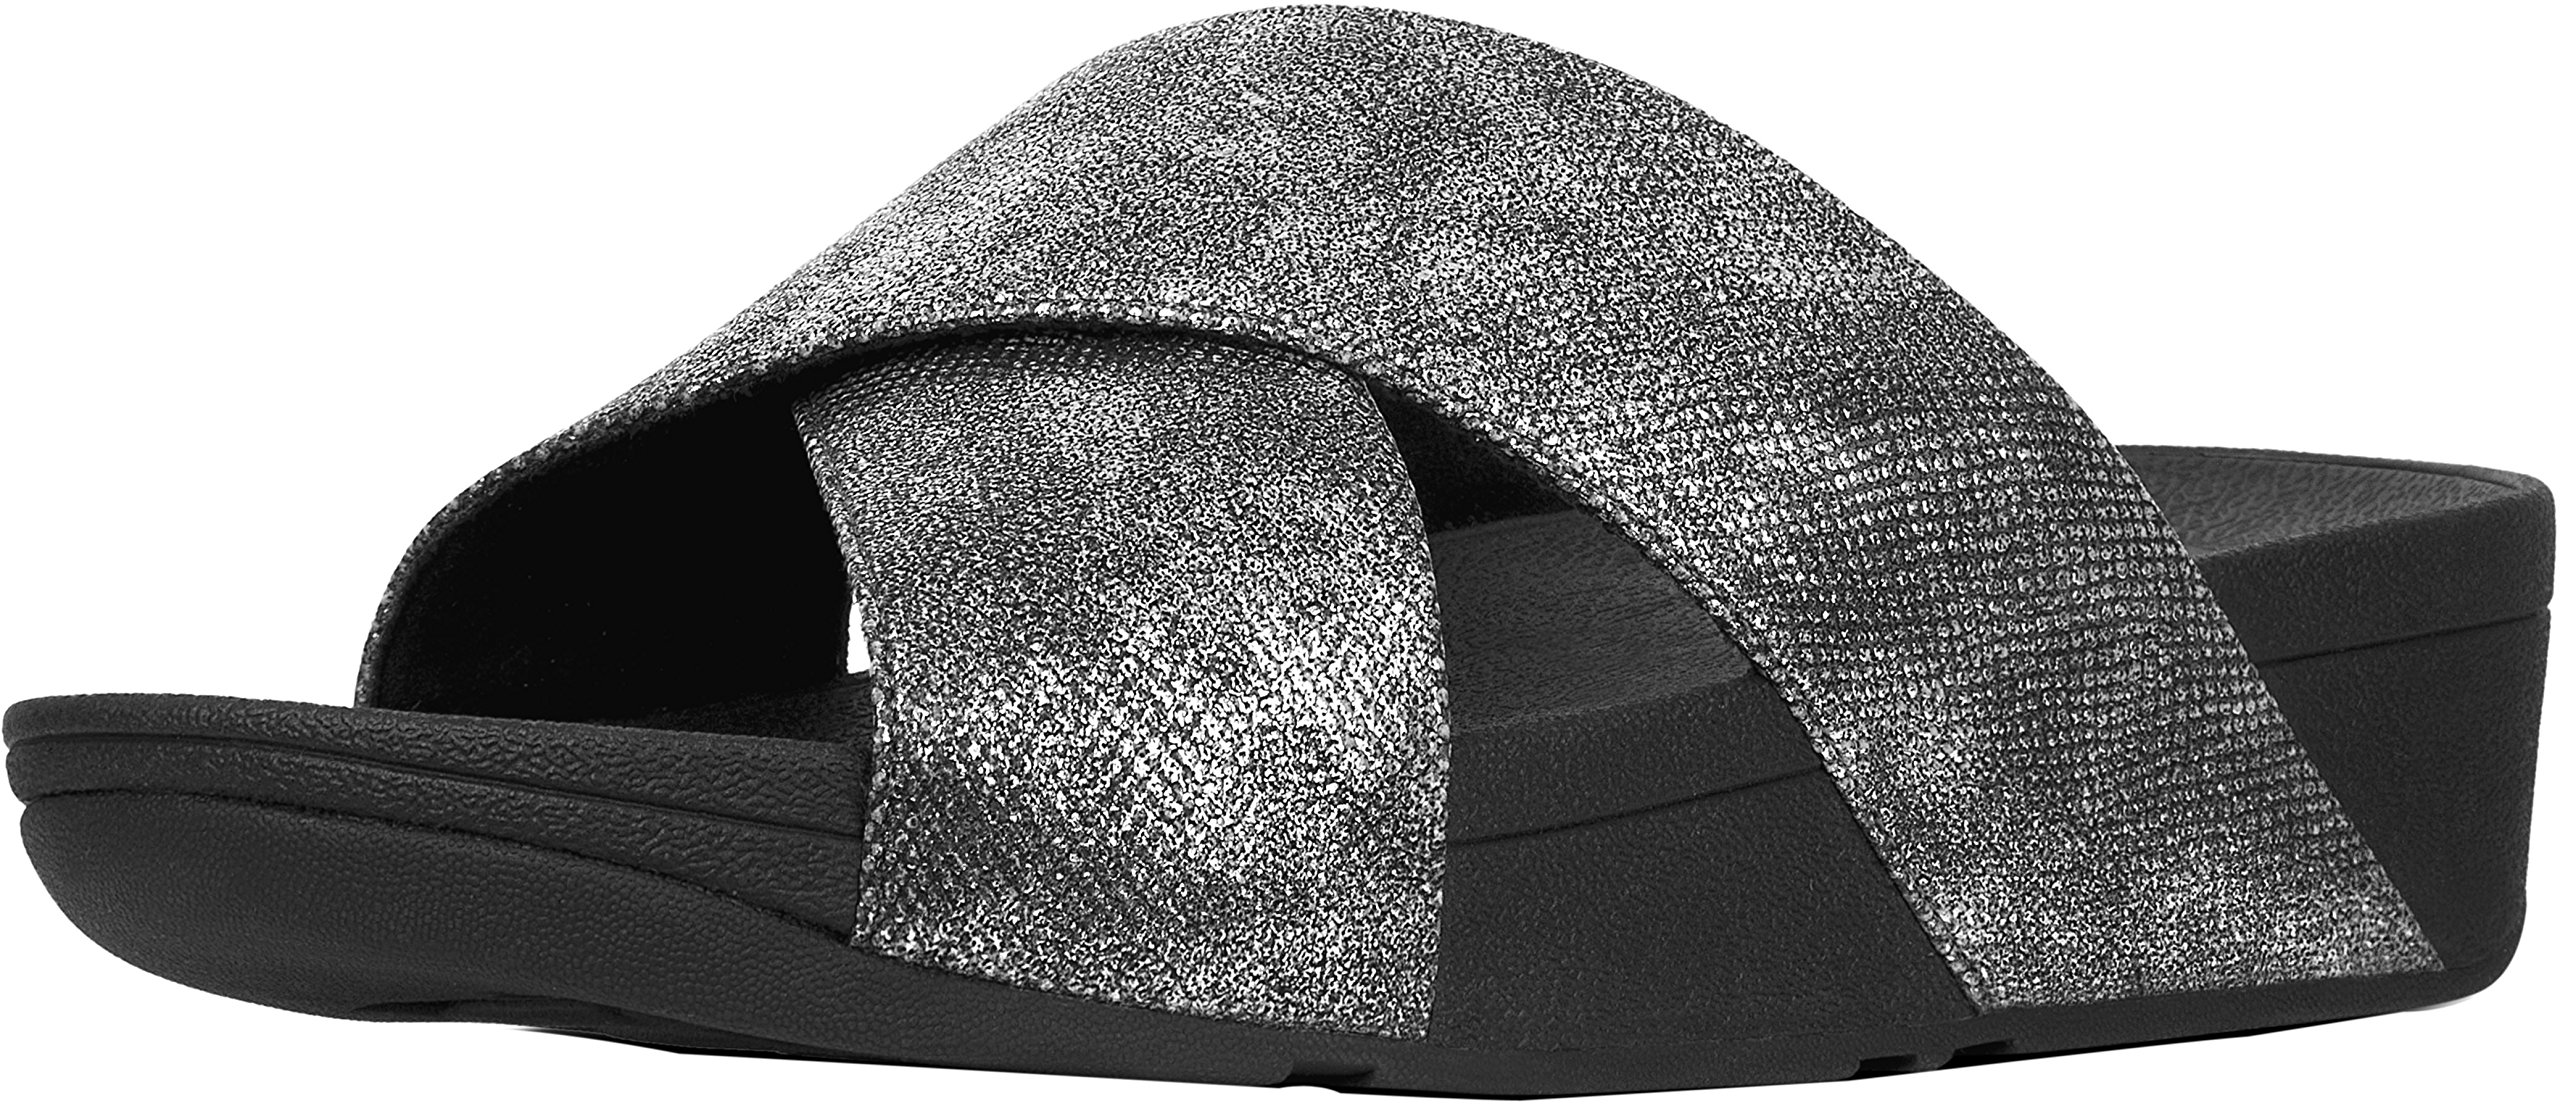 FitFlop Trade; Womens Lulu™ Cross Slide Sandals - Shimmer-Print, Black Shimmer Print, Size 8